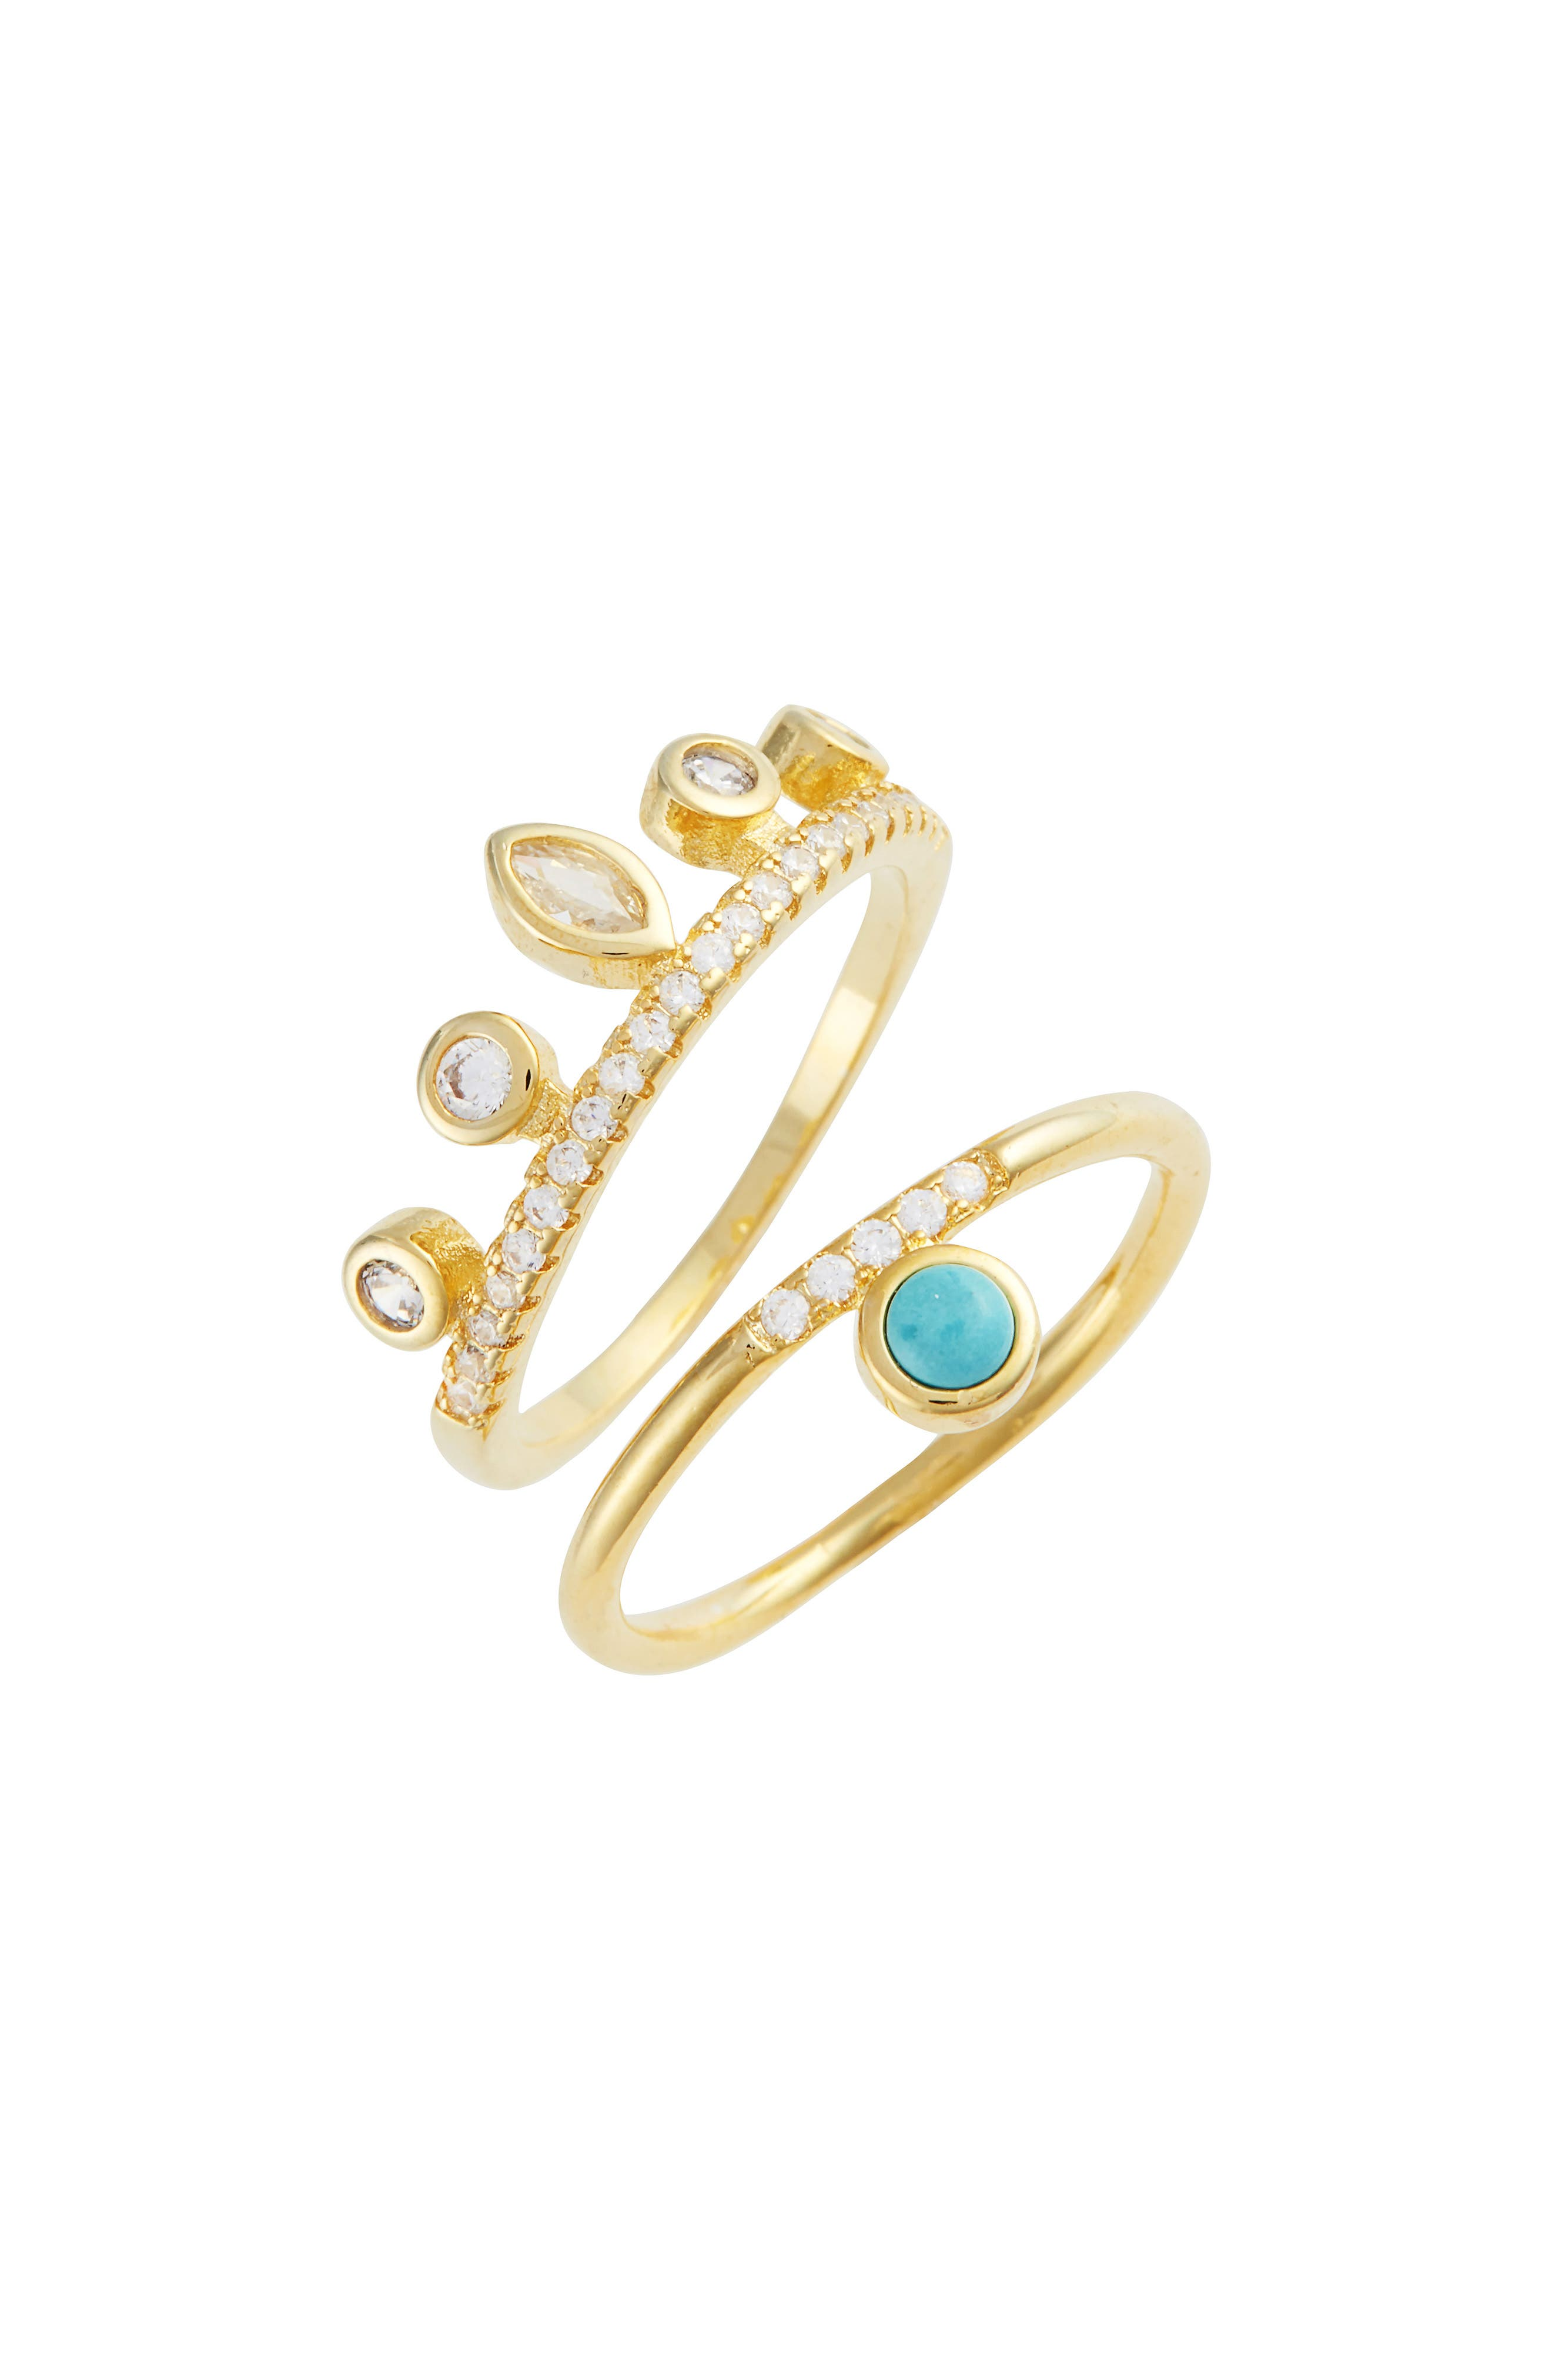 Jacinta Set of 2 Turquoise & Crystal Rings,                             Main thumbnail 1, color,                             Gold